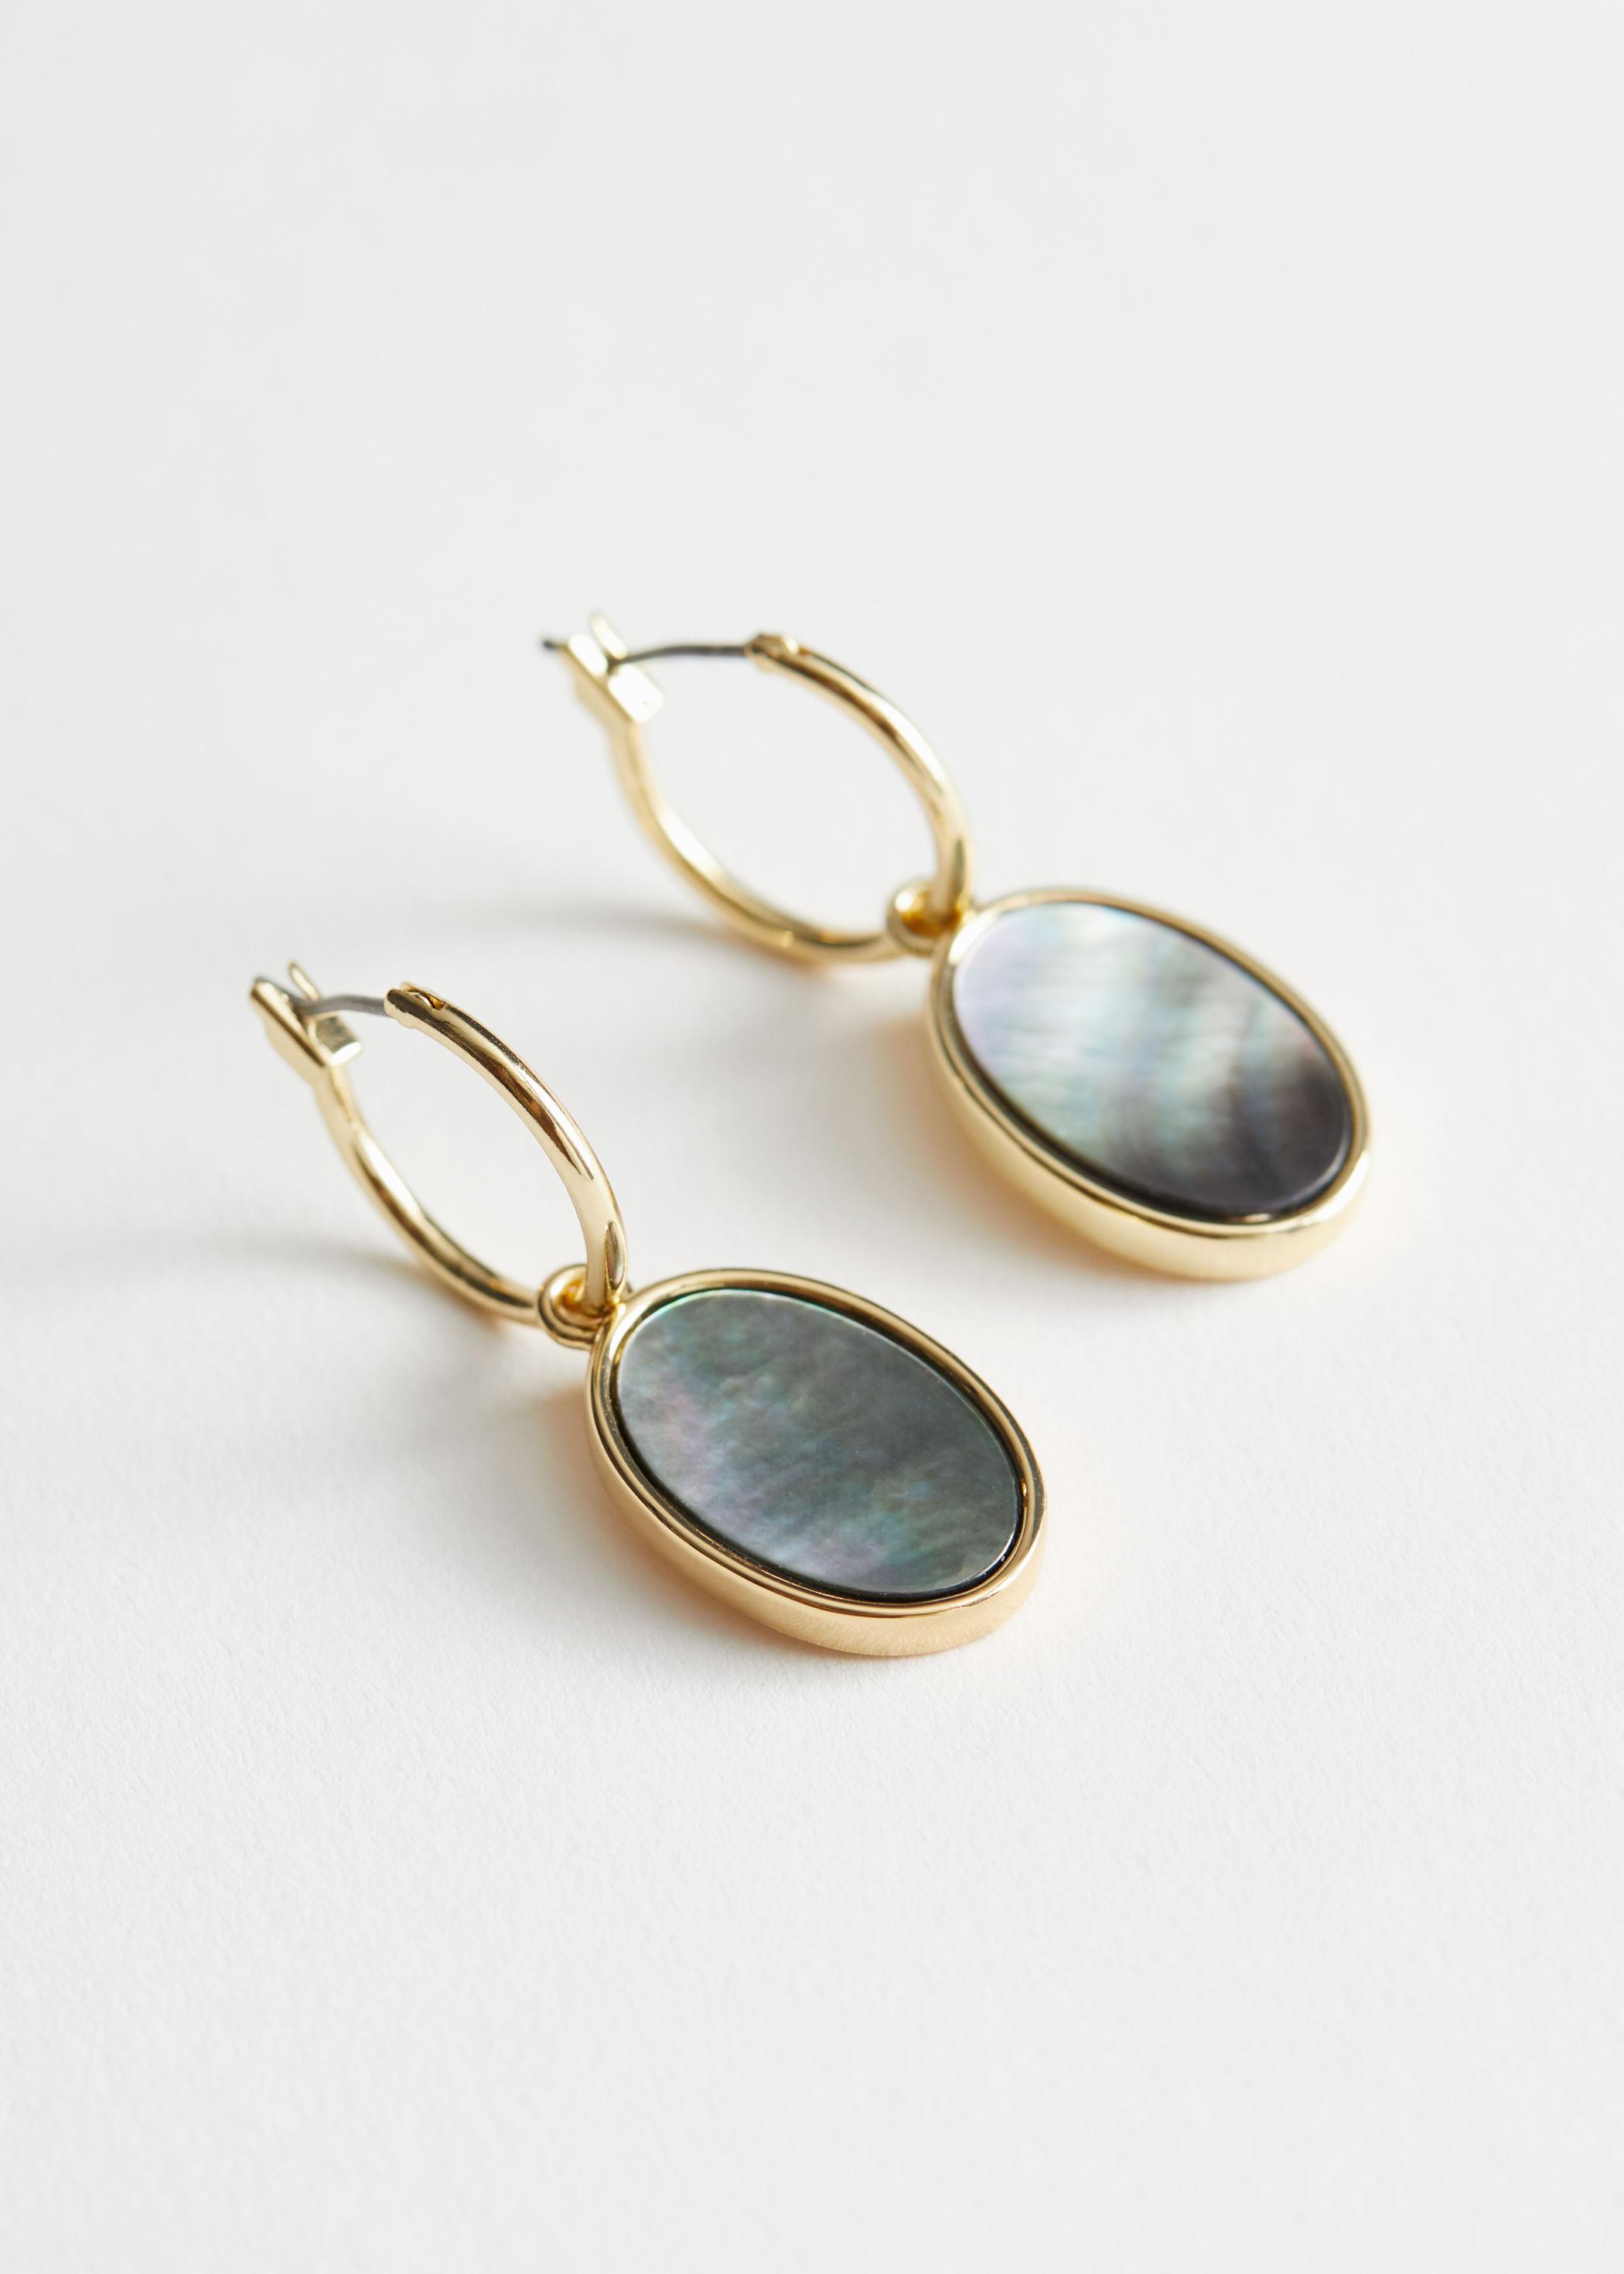 oval shell pendant hoop earrings